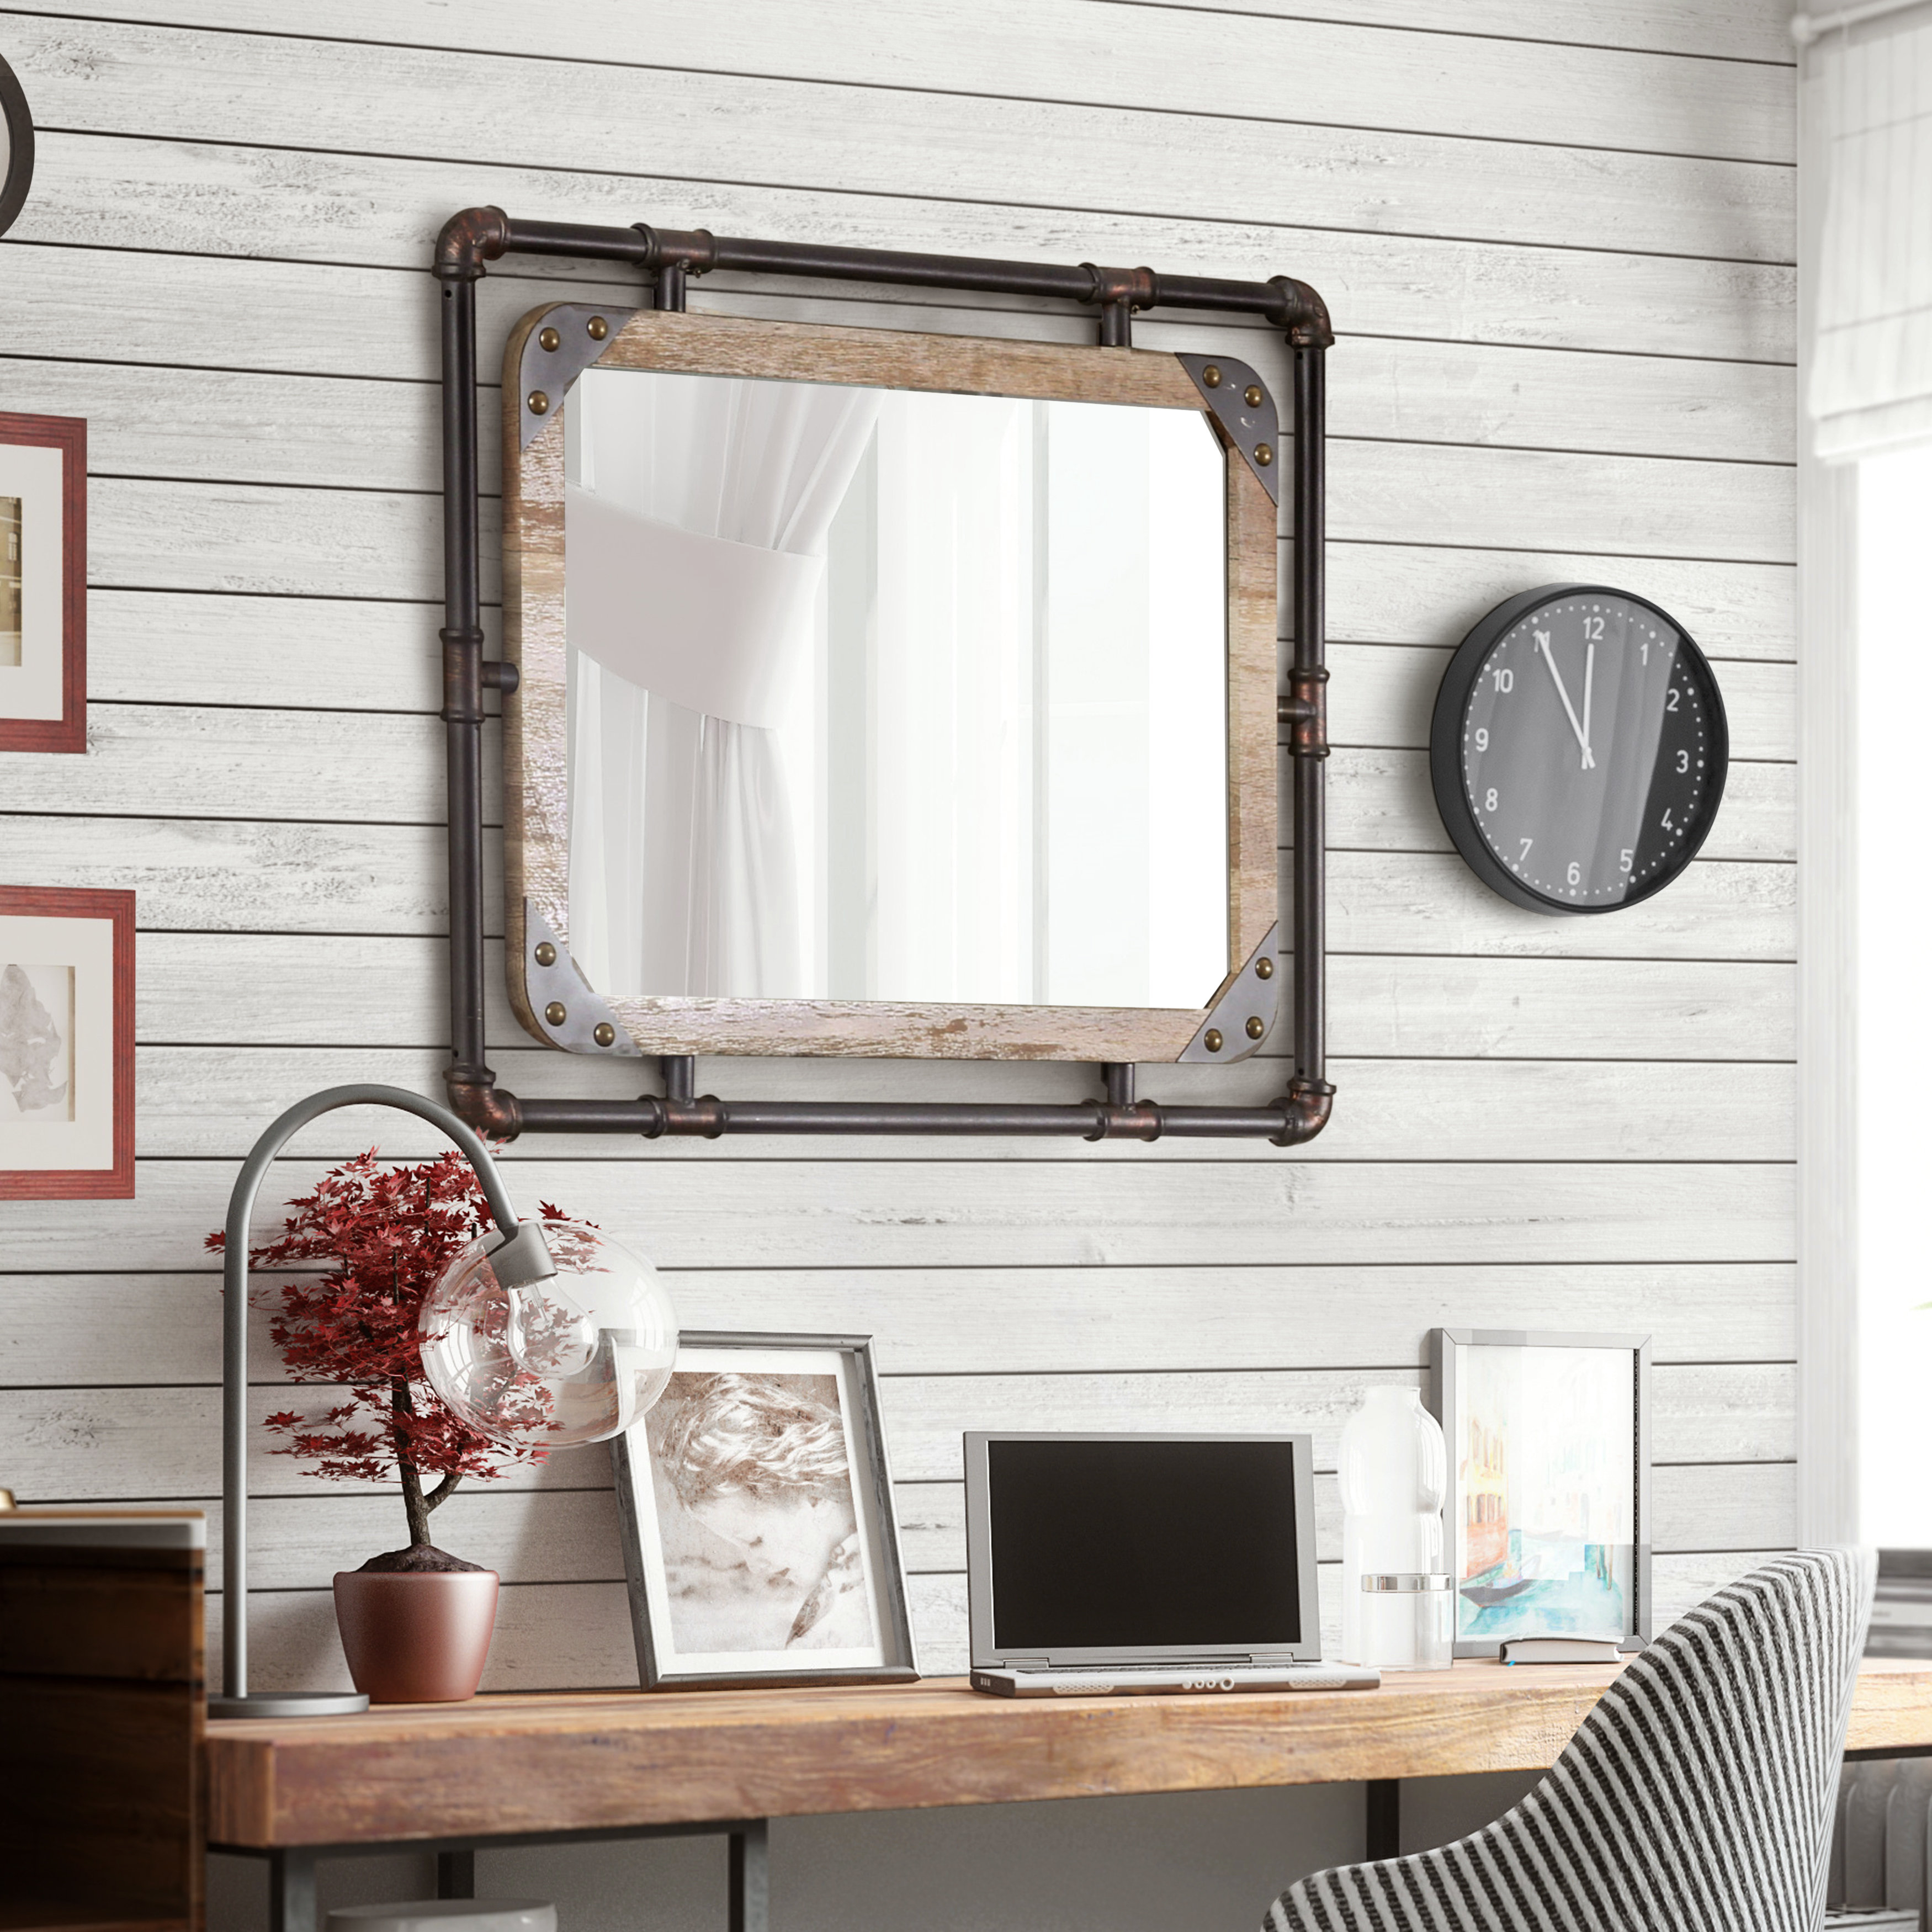 Capri Bathroom Mirror Pertaining To Peetz Modern Rustic Accent Mirrors (View 18 of 30)